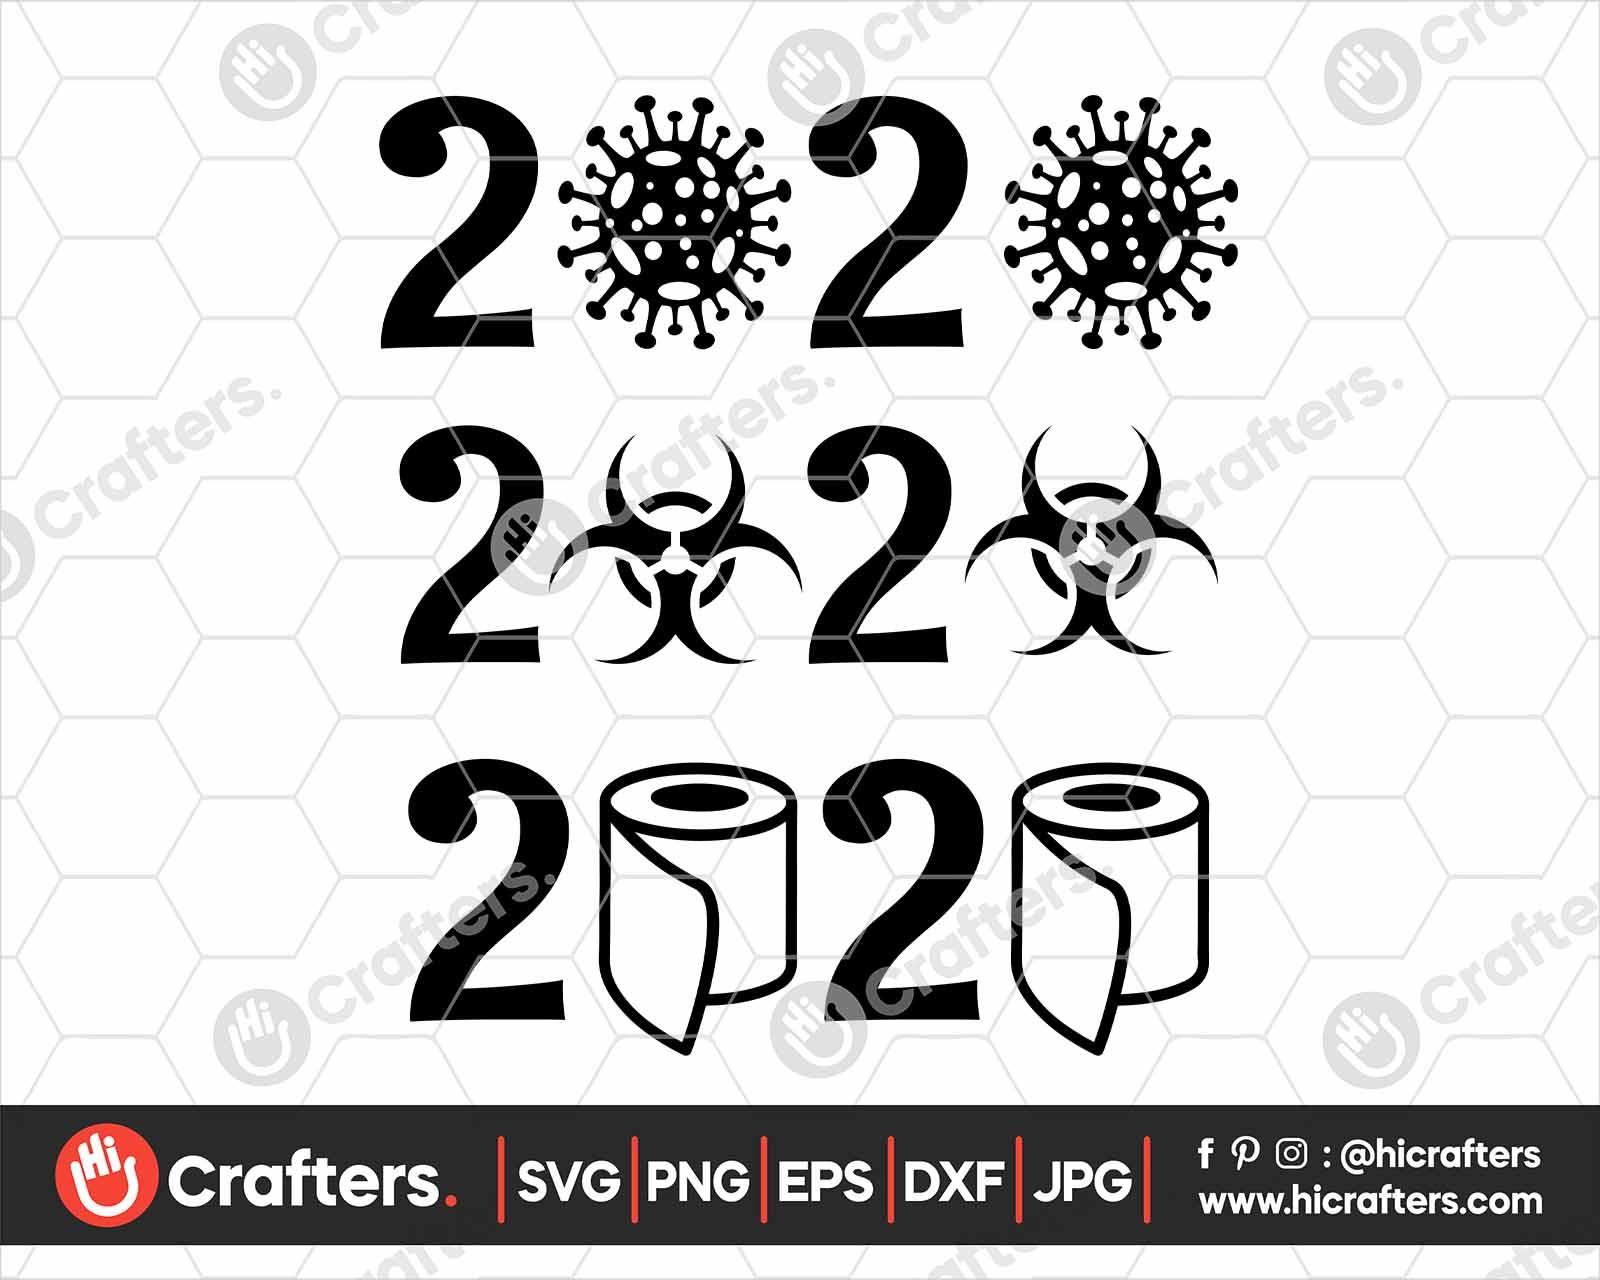 2020 Toilet Paper Svg Corona Svg Png Hi Crafters